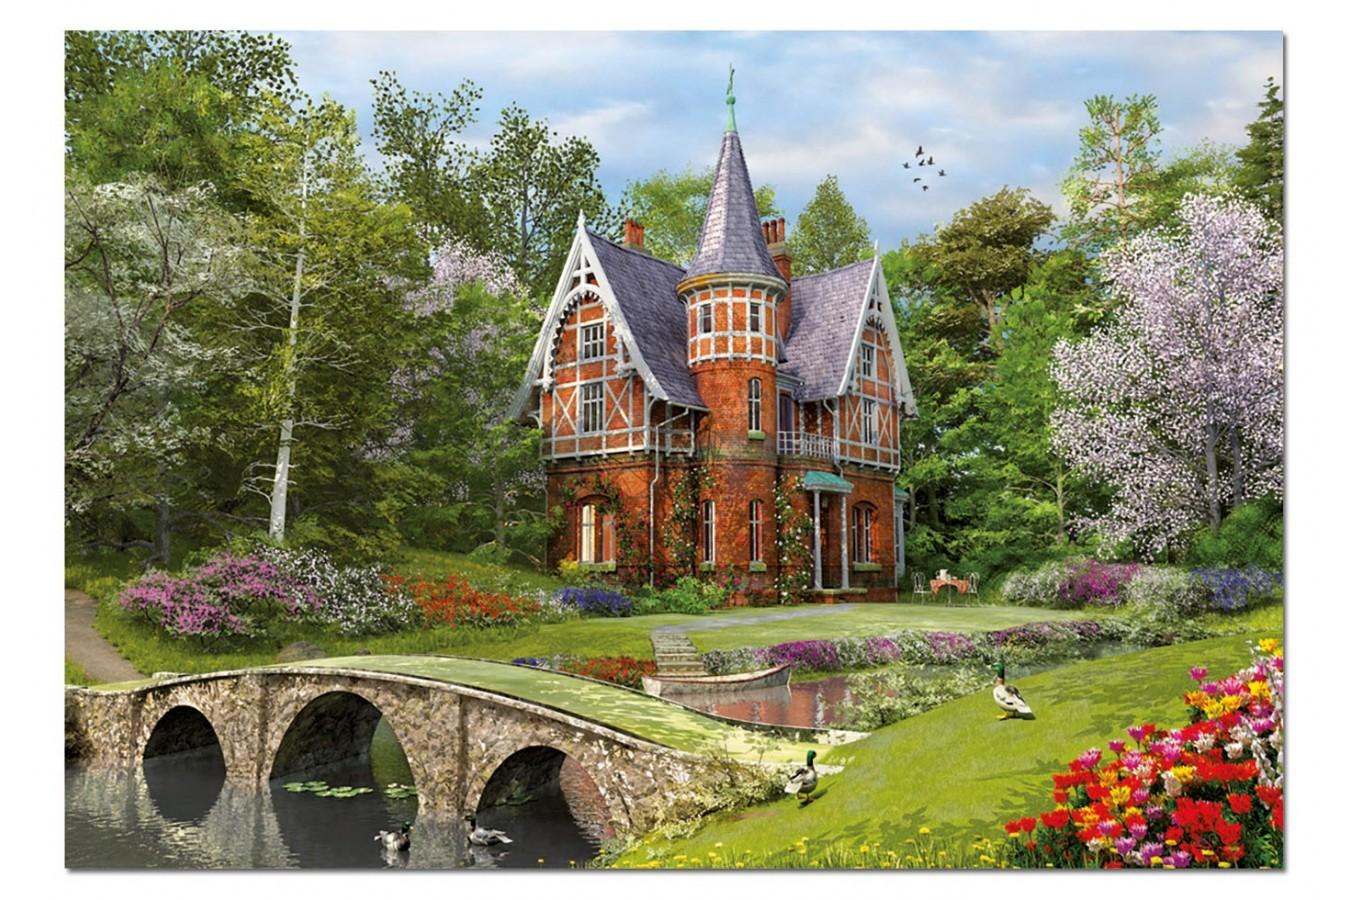 Puzzle Educa - Dominic Davison: House near the Bridge, 1000 piese, include lipici puzzle (15519)